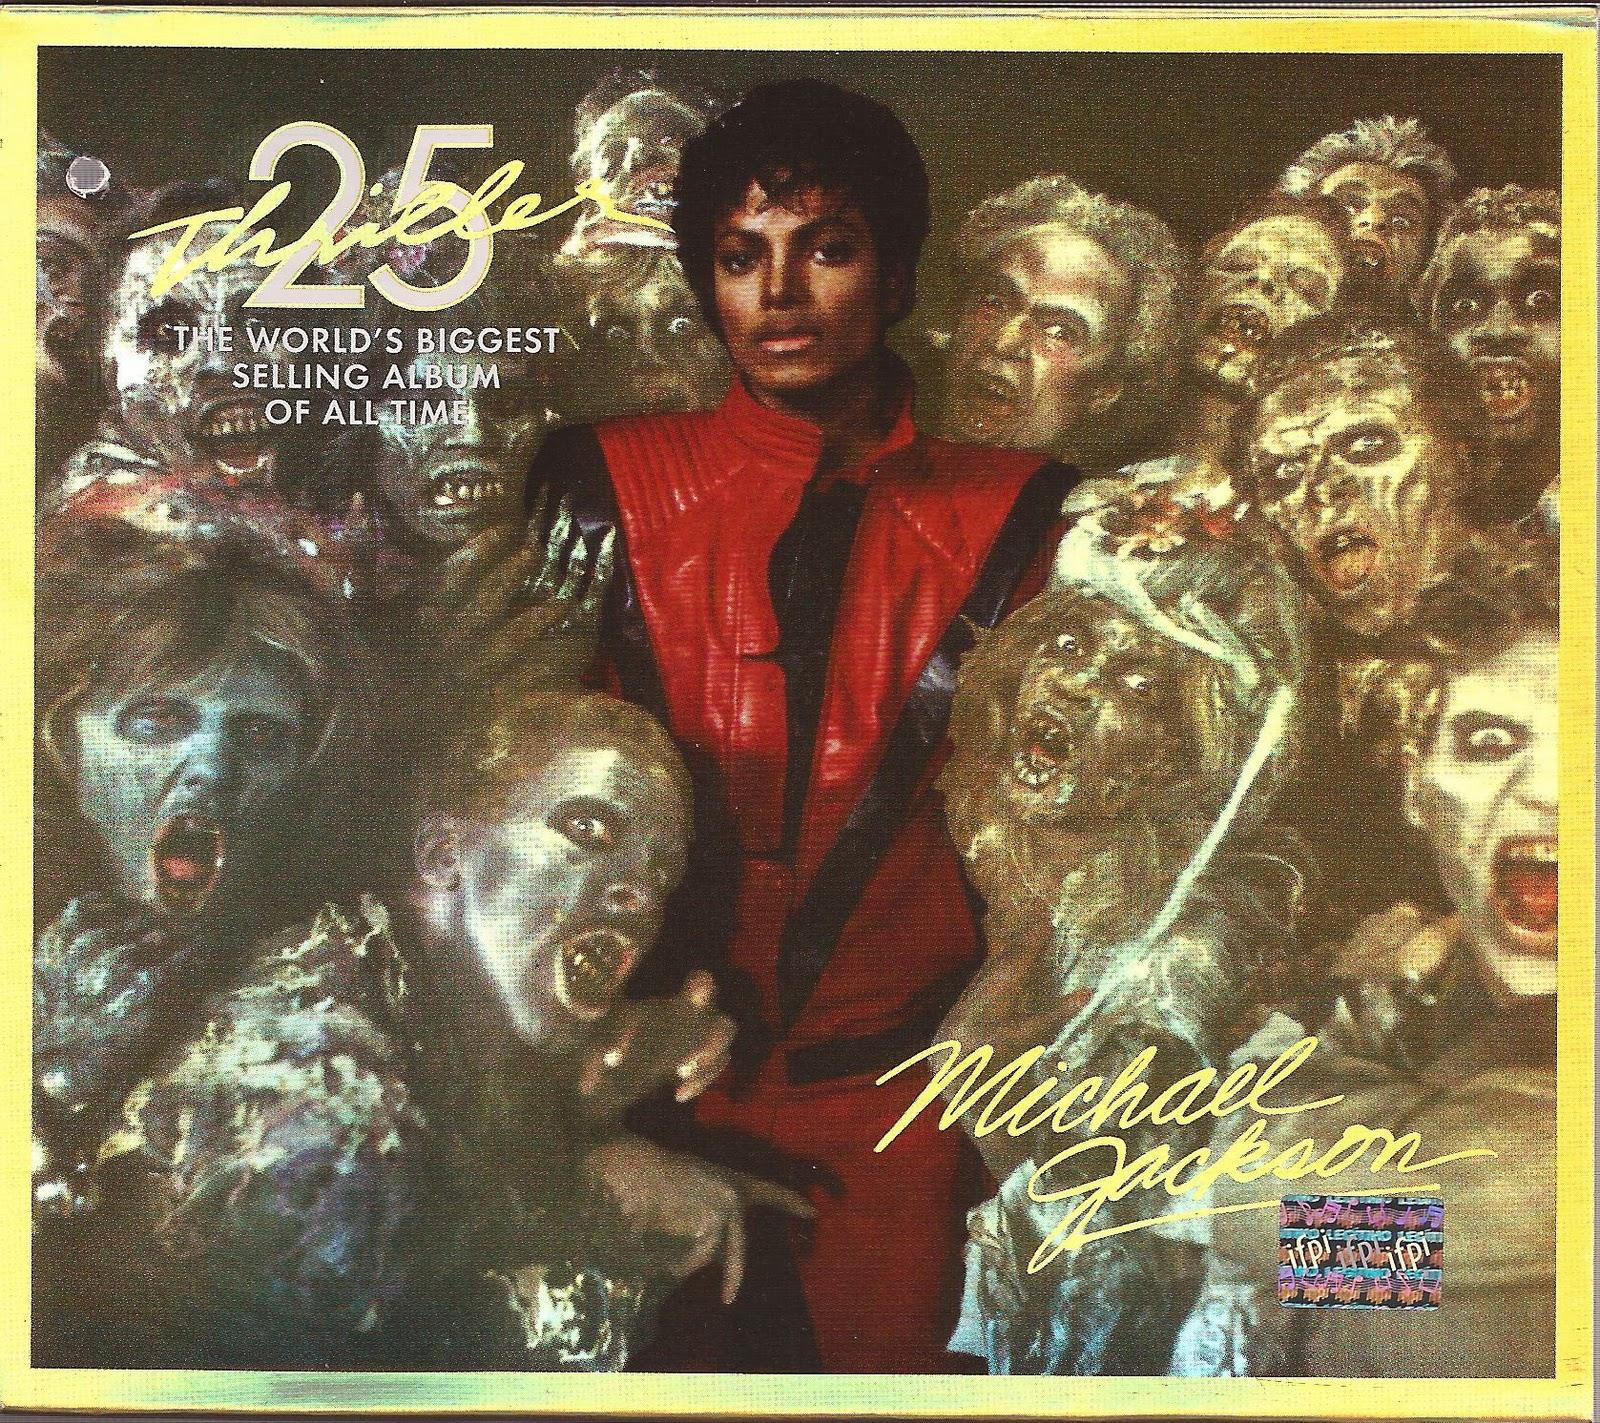 http://4.bp.blogspot.com/-WaTF6HKN7u0/TqY6C5FmbpI/AAAAAAAAAng/RXyjTbSLJ3U/s1600/Funda+Michael+Jackson+Thriller+25.jpg